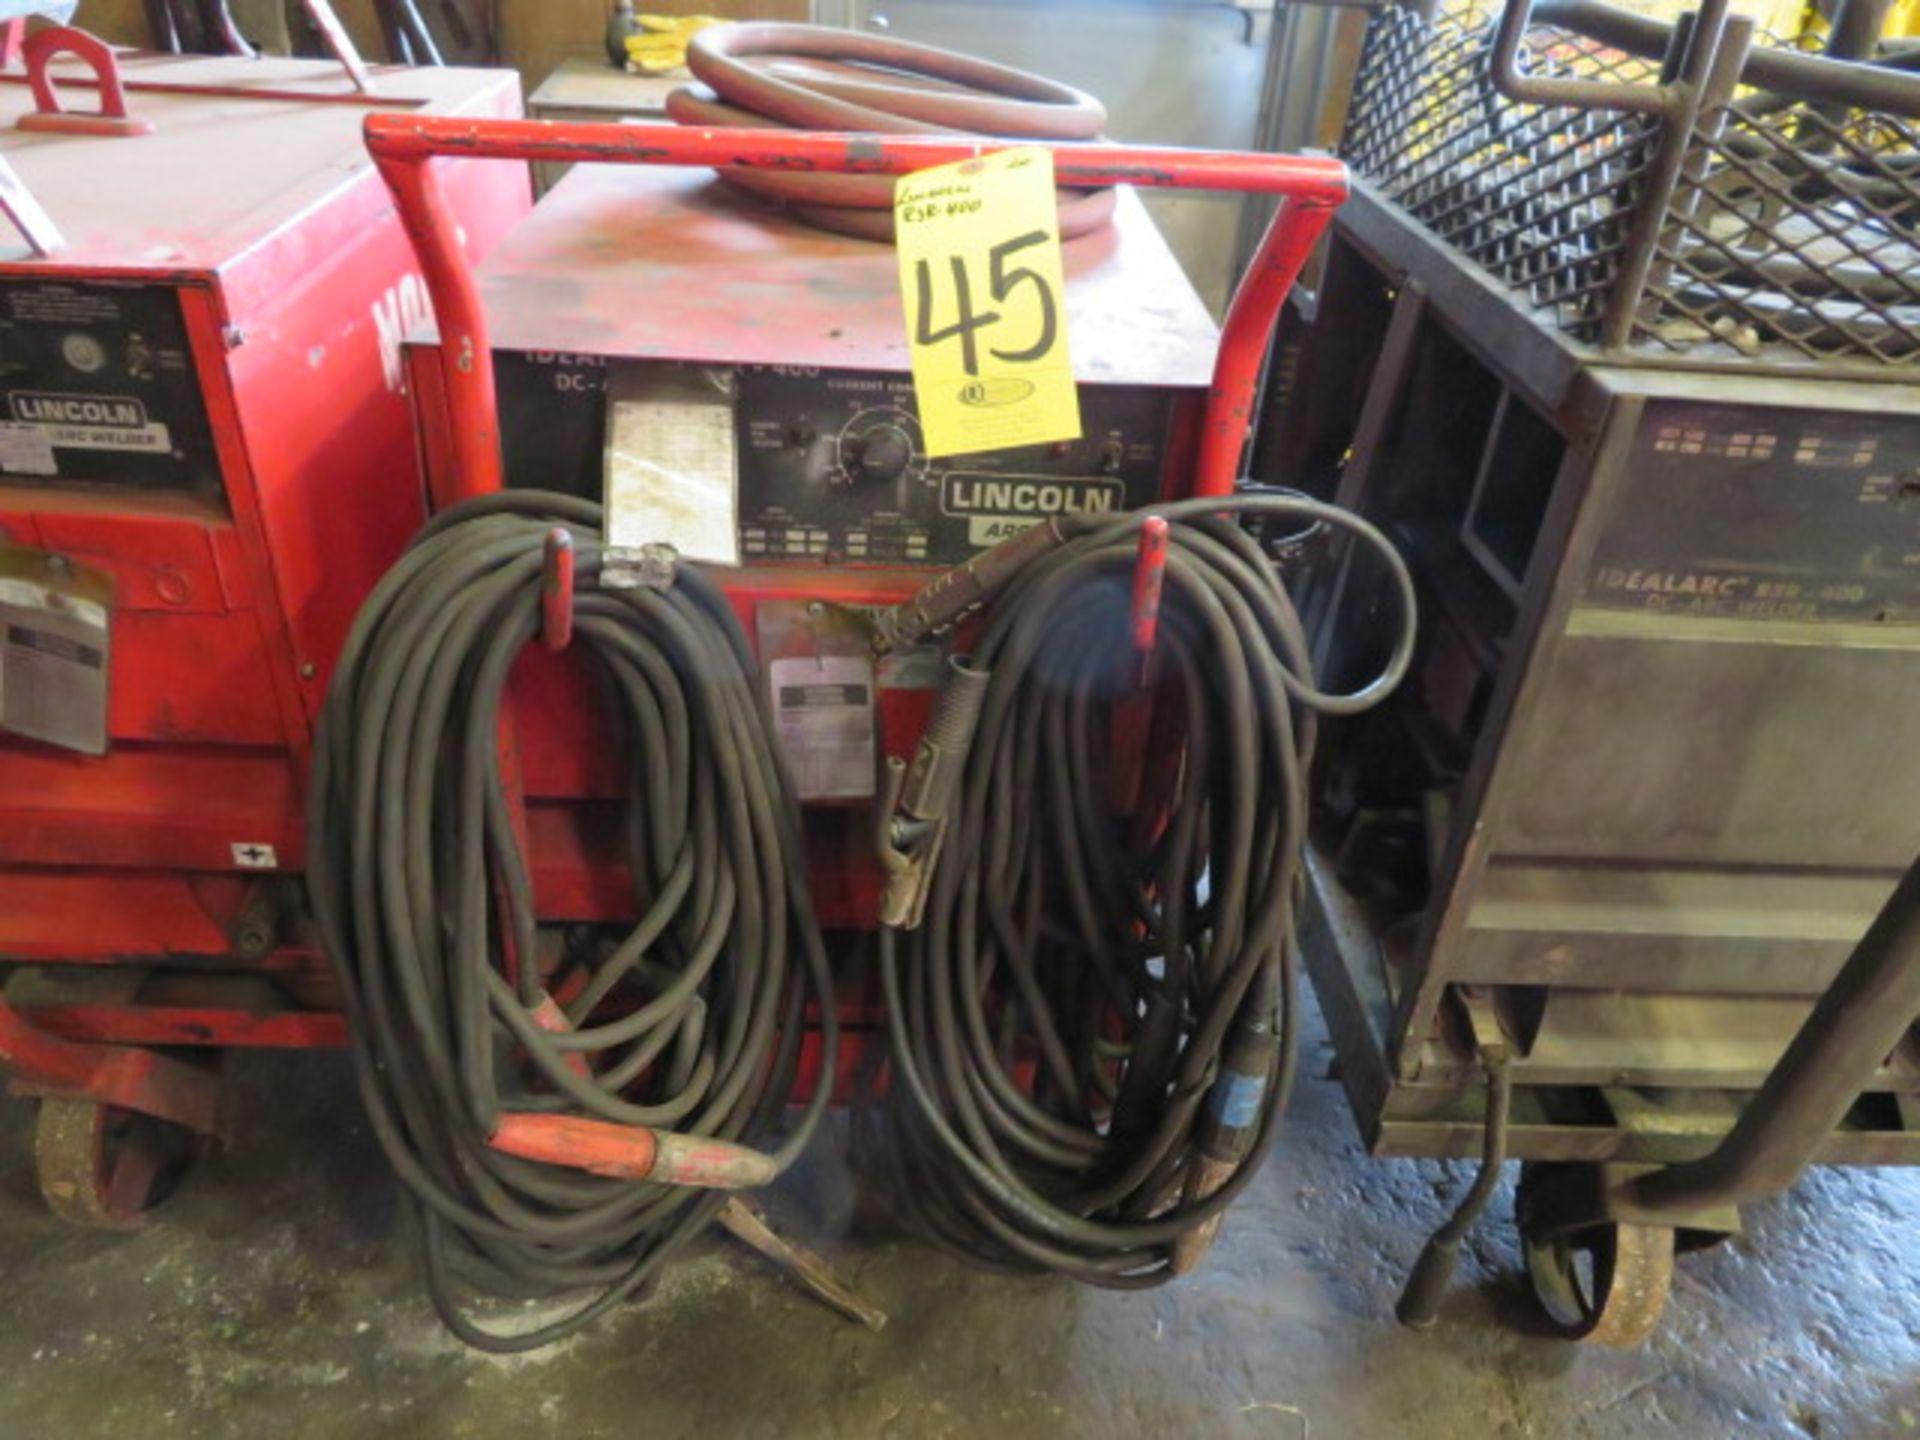 Lot 45 - LINCOLN IDEALARC R3R-400 TIG WELDER W/CART & WELDING LEADS